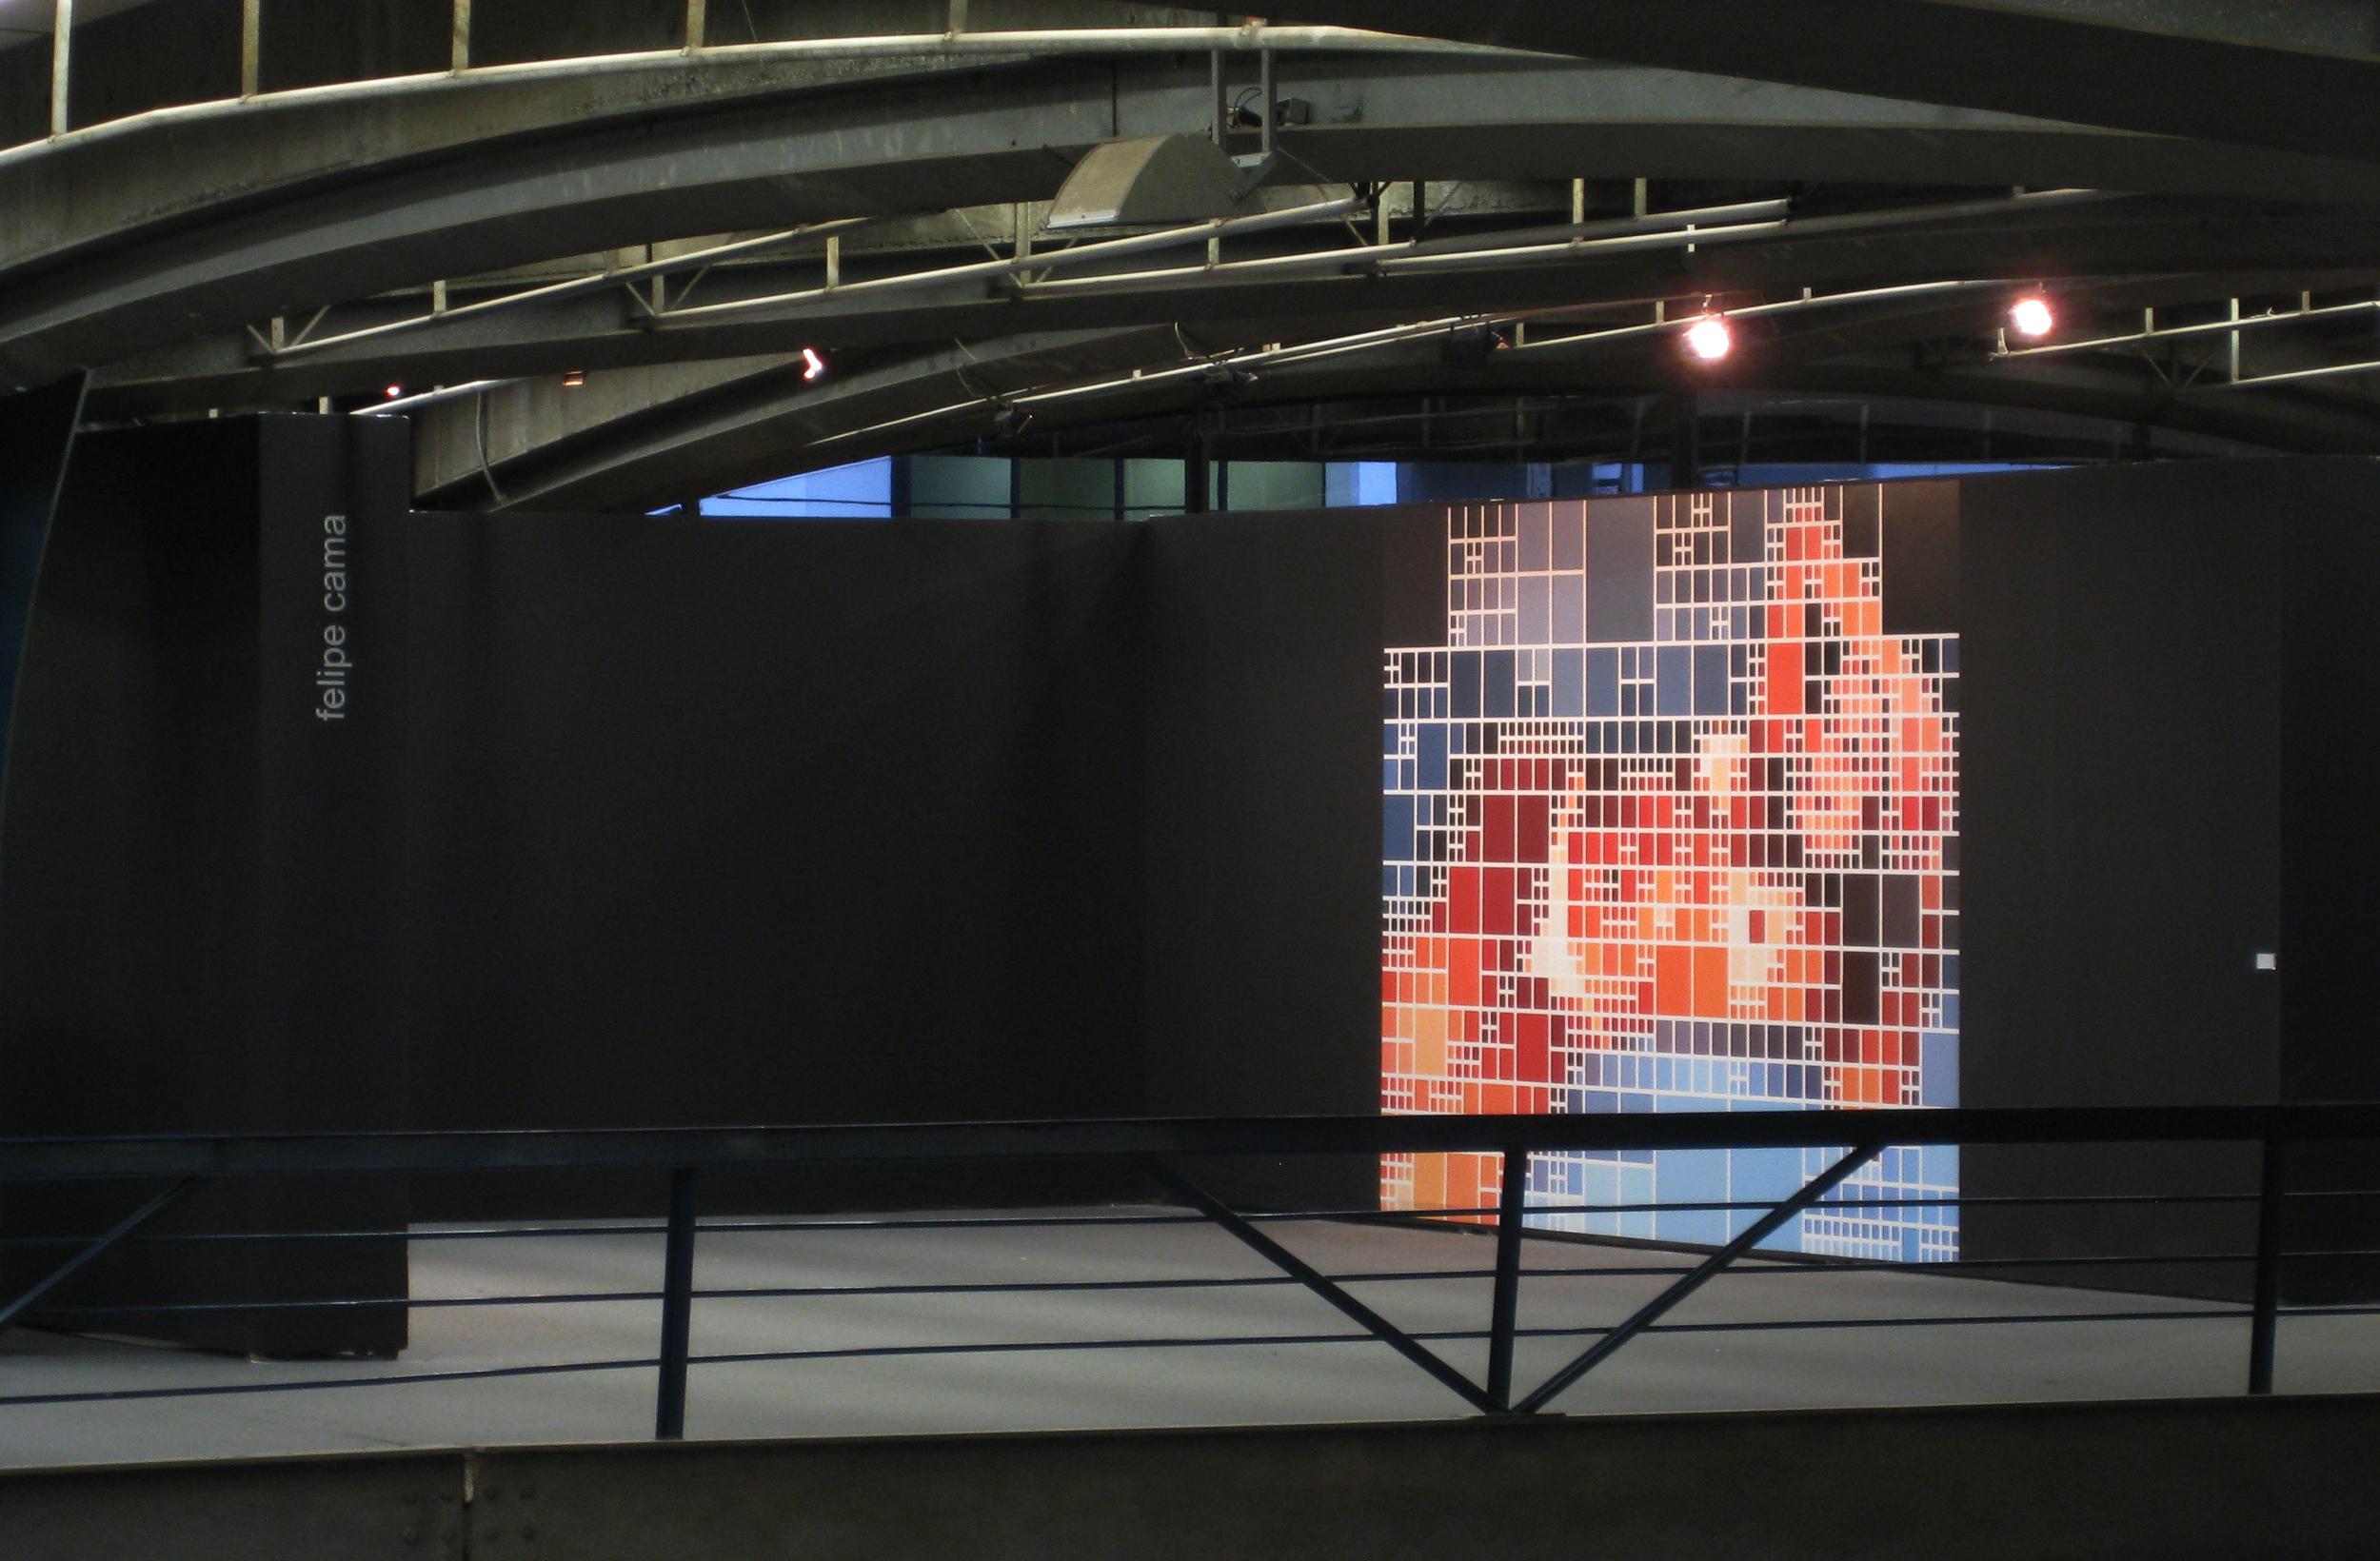 Solo showat São Paulo Cultural Center  , November 2007. Work shown:  Modigliani x Alexandra (2007).